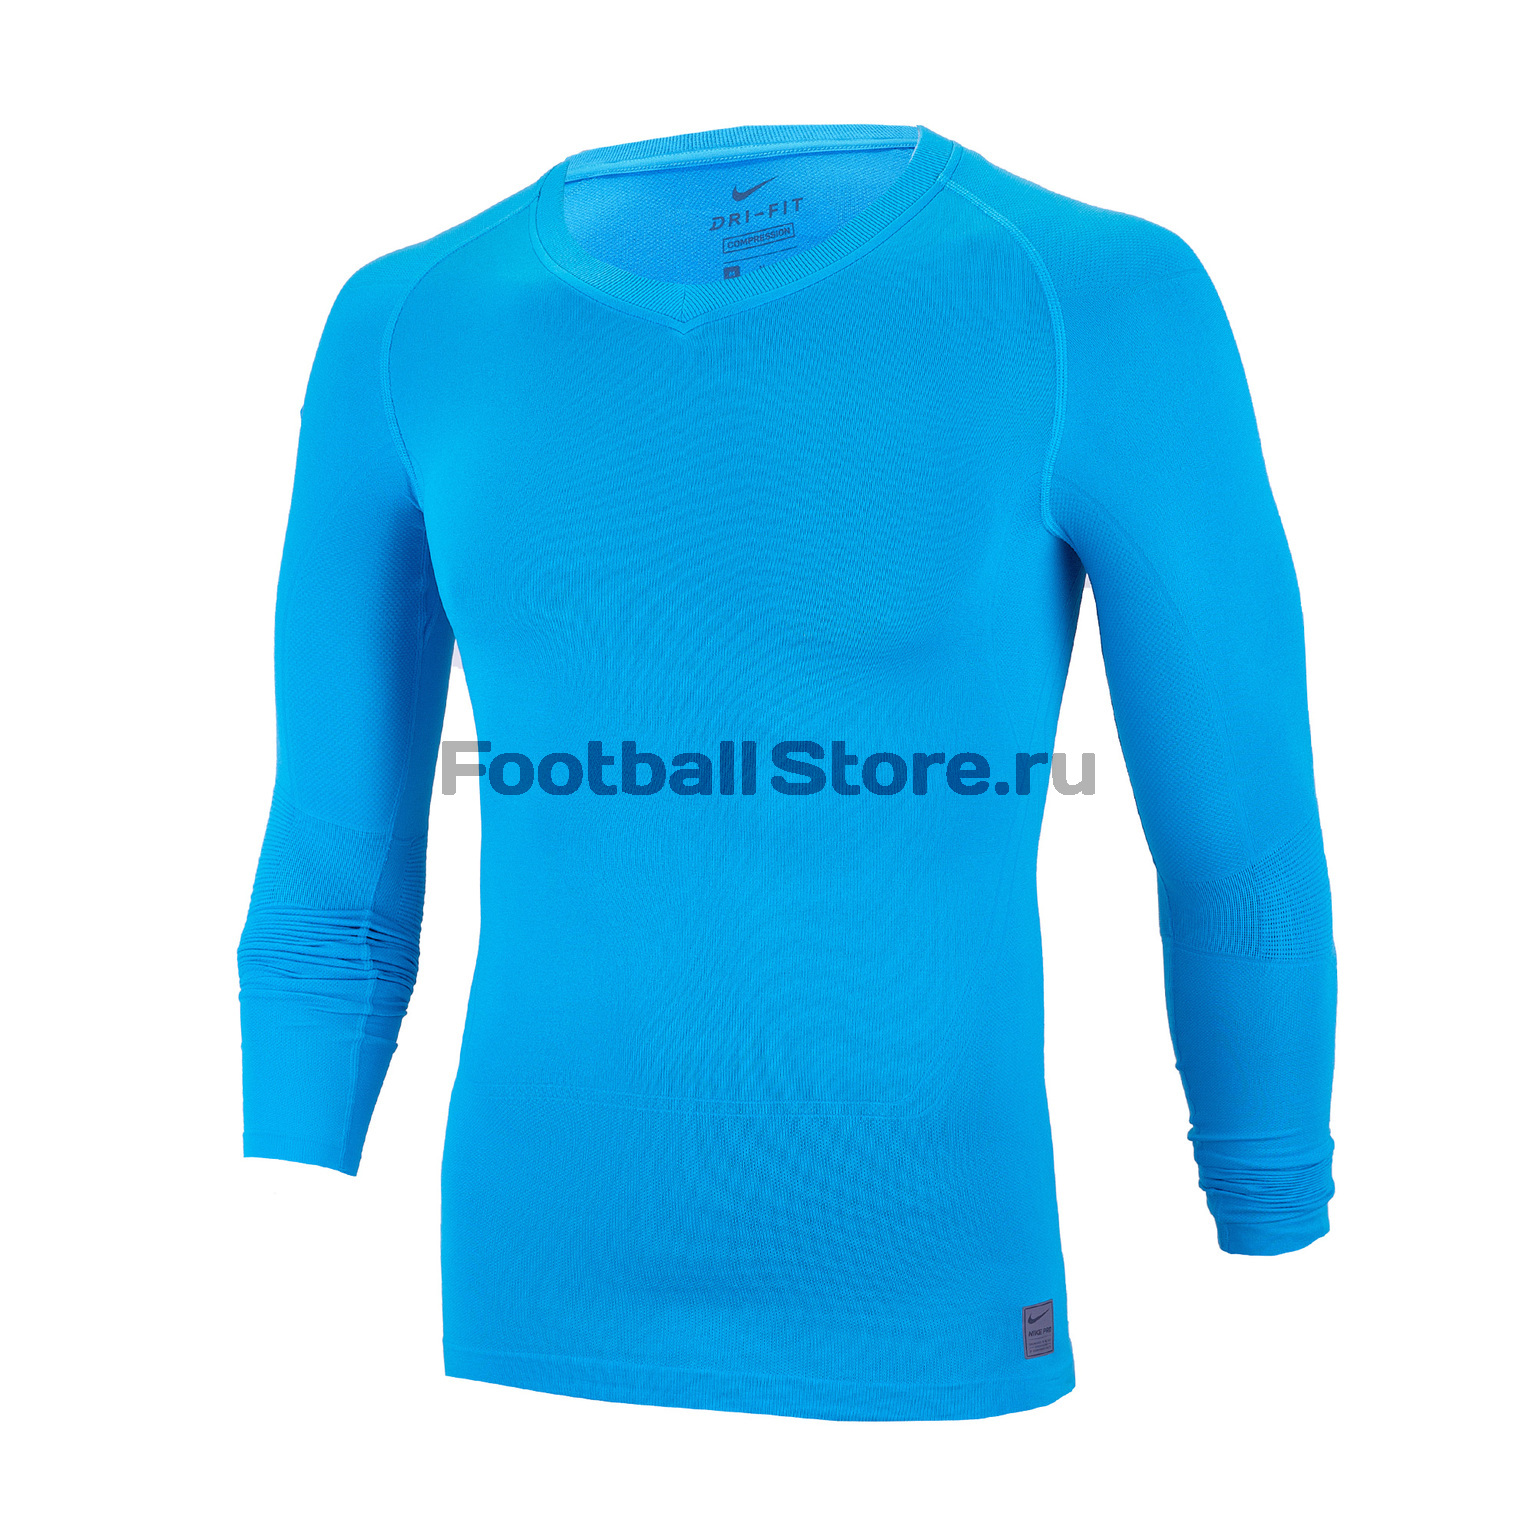 Белье футболка Nike LHTWT LS 824618-498